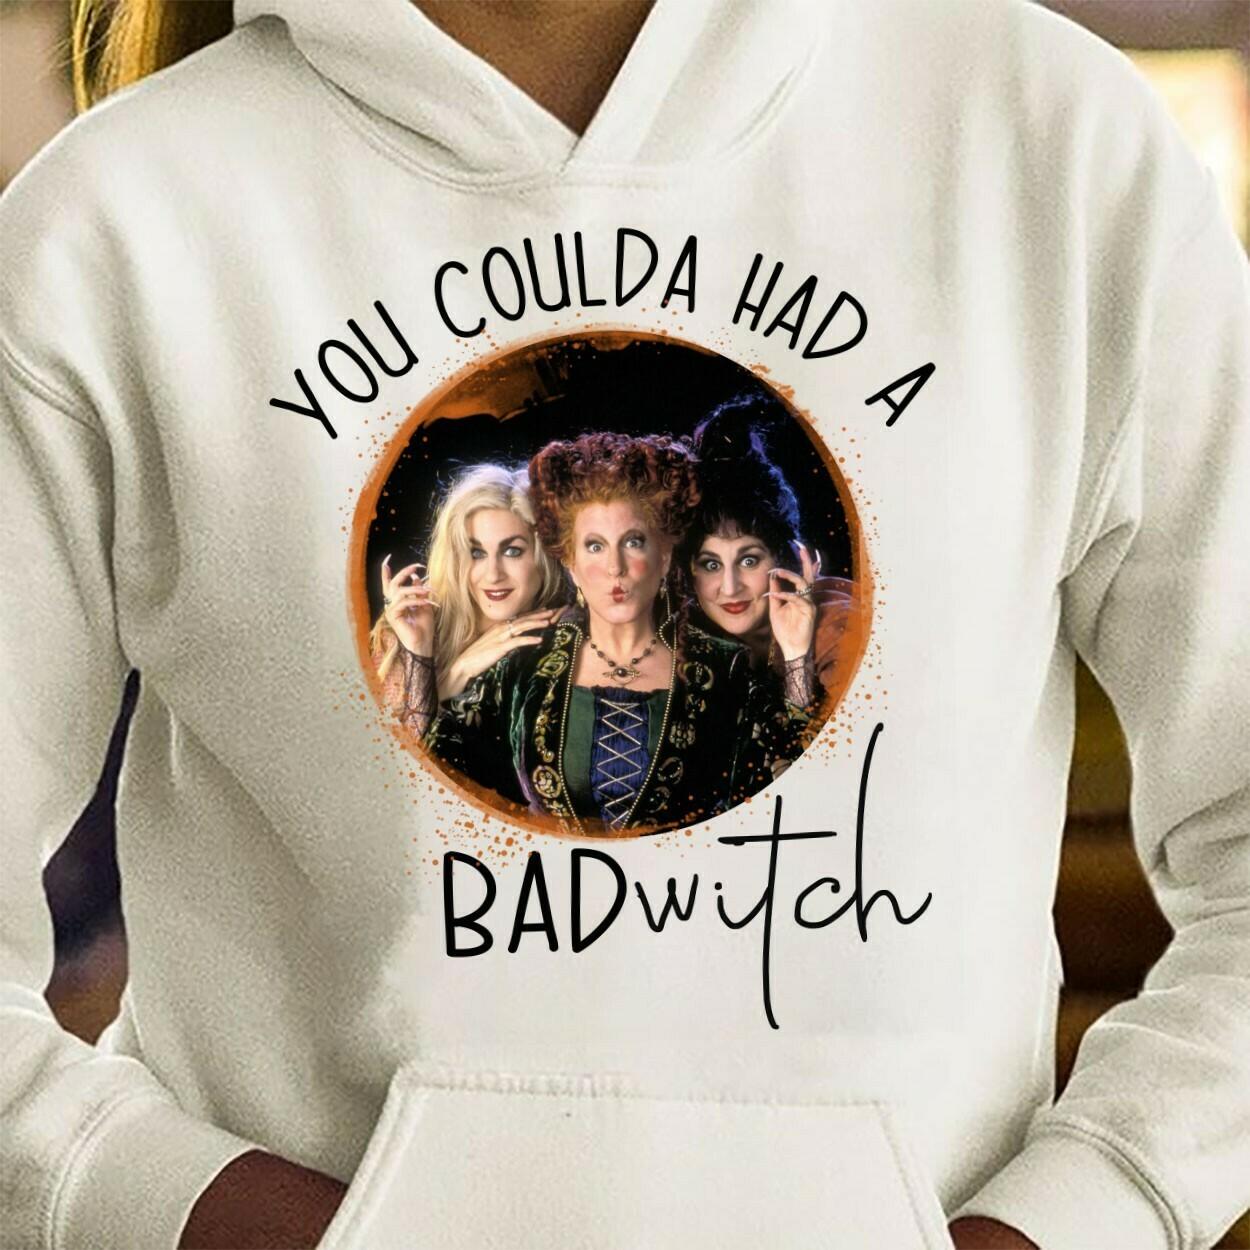 Halloween You Coulda Had A Bad Witch Sanderson Sisters Hocus Pocus Mandala Disney Villains Have More Fun Walt Disneyland Park T-Shirt Long Sleeve Sweatshirt Hoodie Jolly Family Gifts